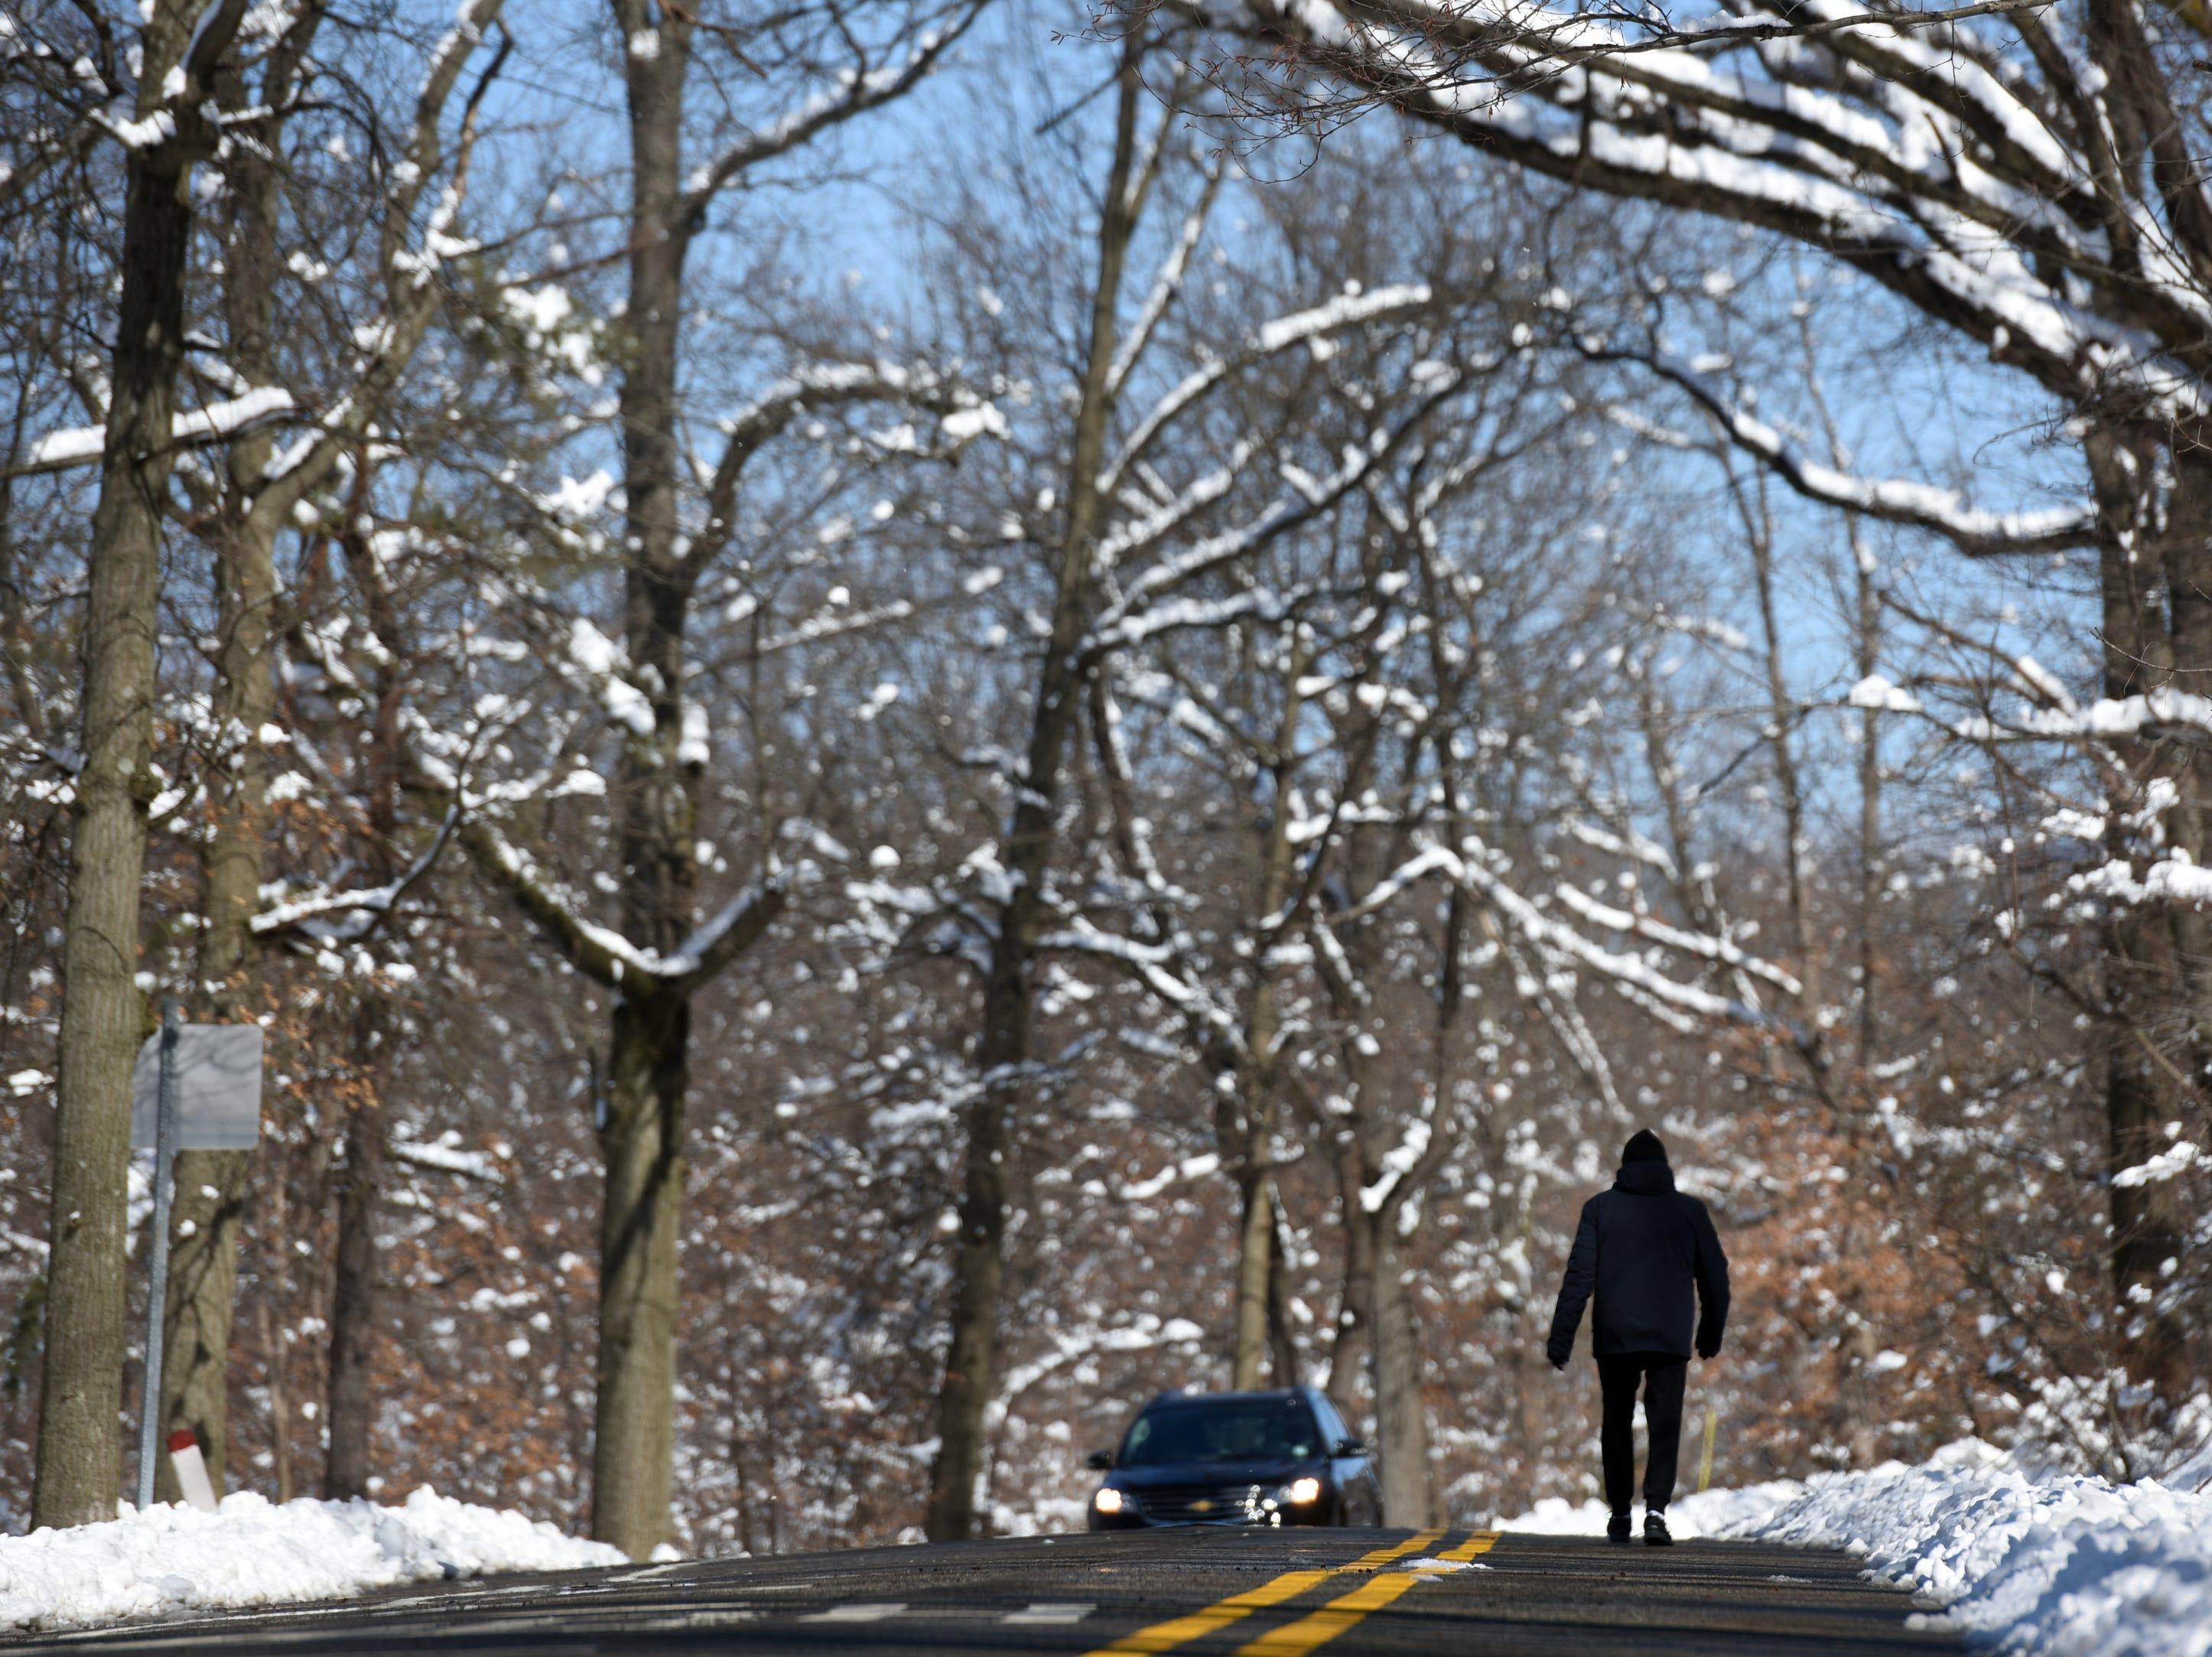 Marek Kubinski of Passaic Park, got in his daily walk at Garret Mountain Reservation on Monday, March 4, 2019. Kubinski walks daily regardless of the weather.